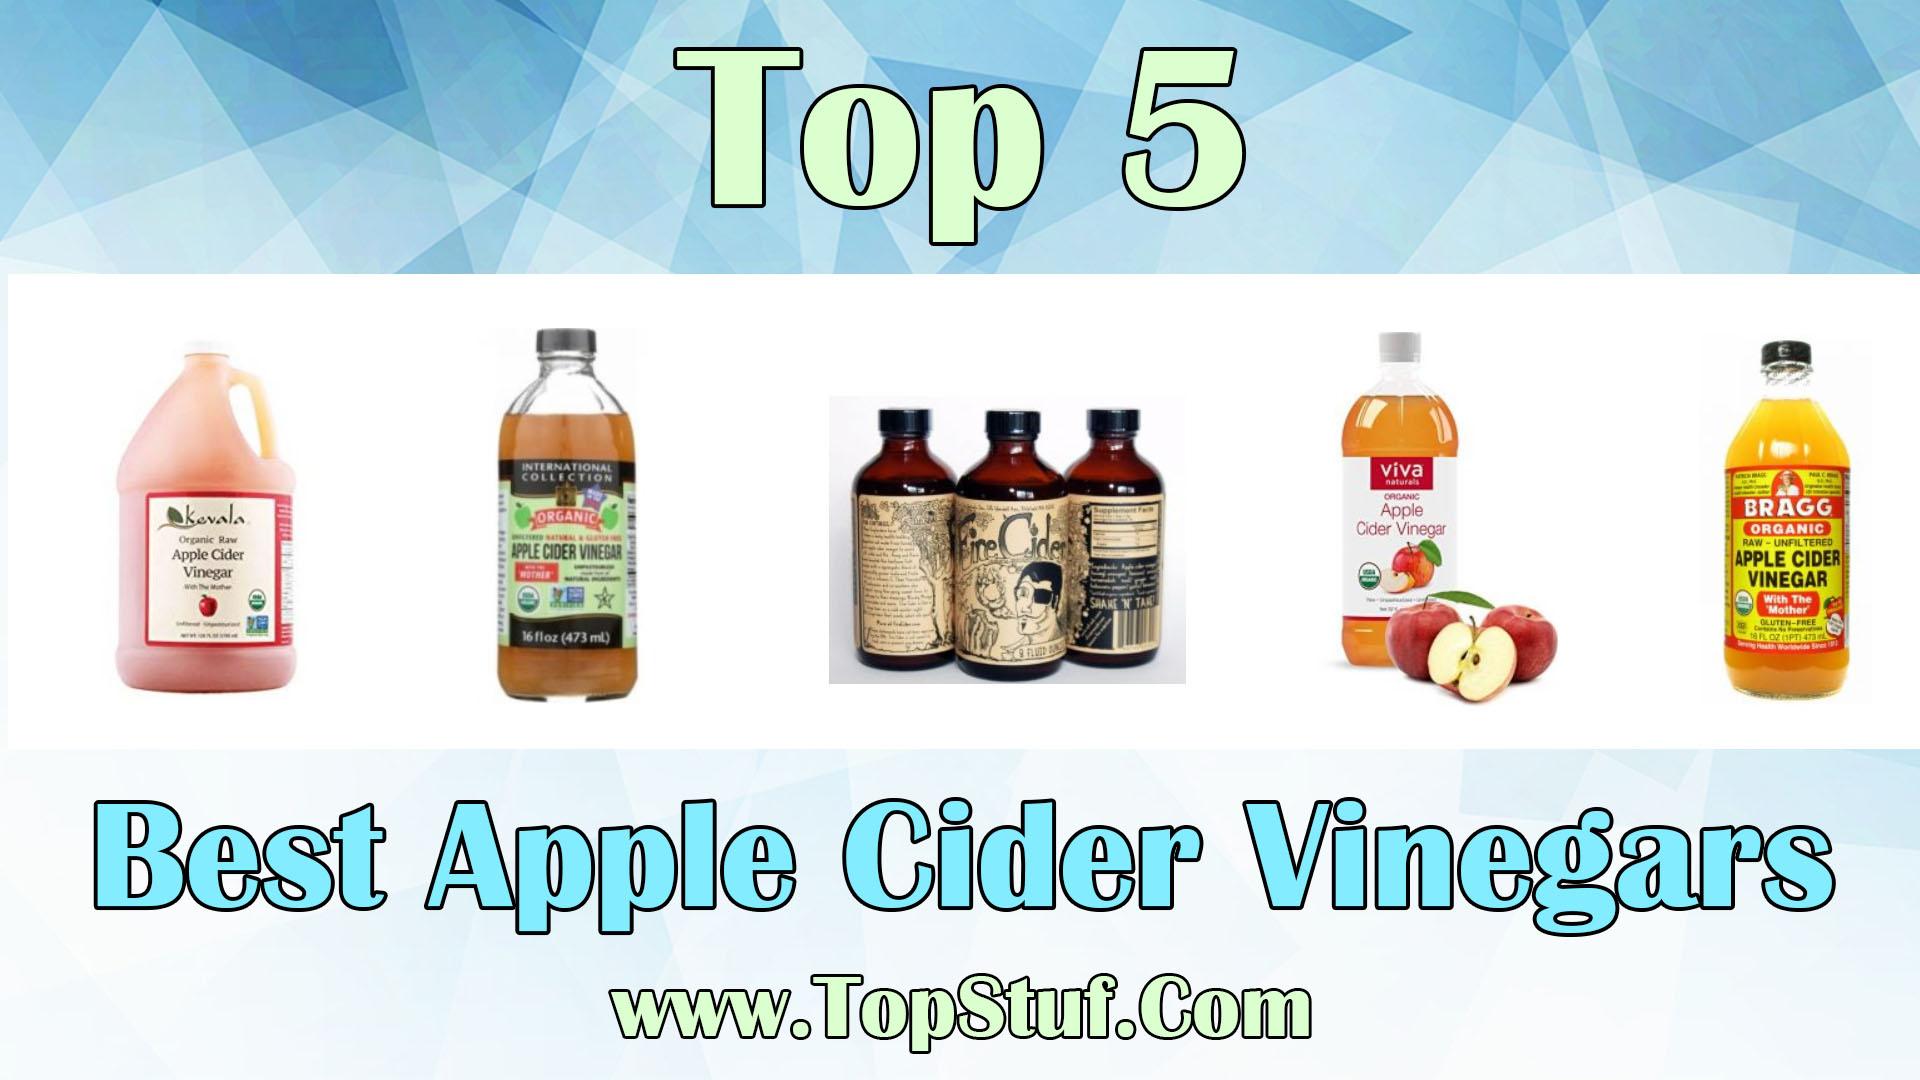 Best Apple Cider Vinegars